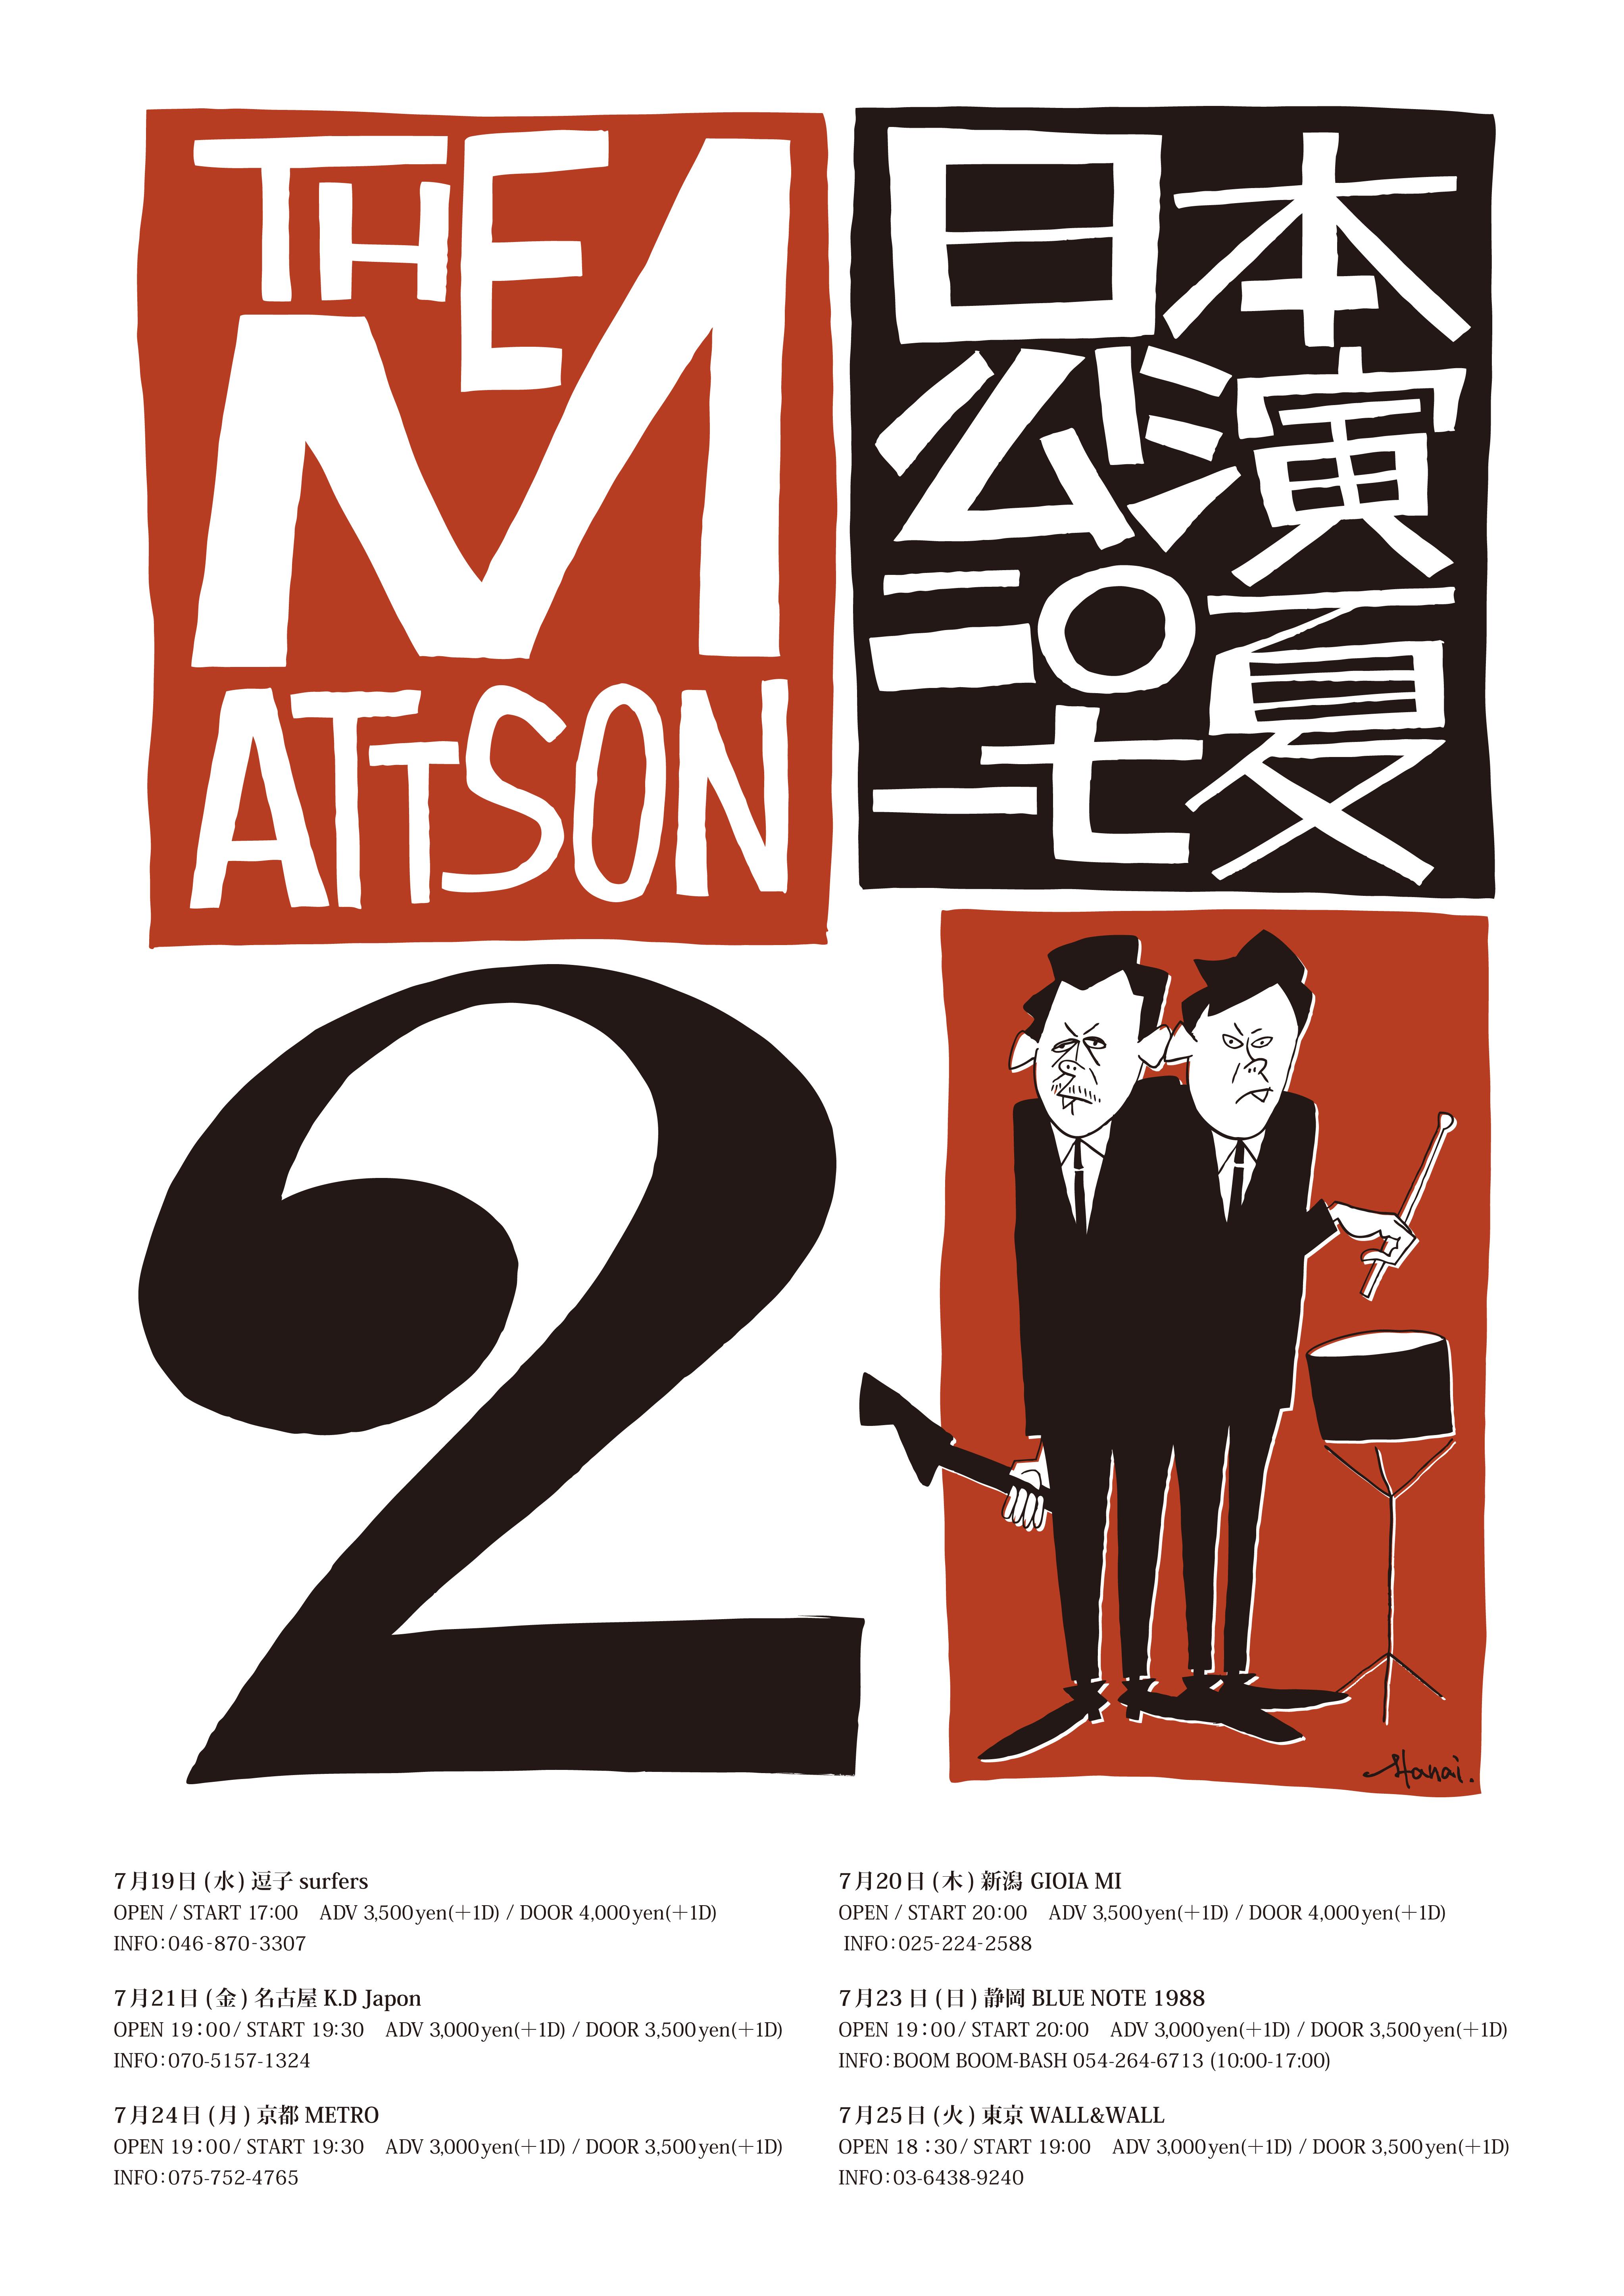 The Mattson 2 フライヤー